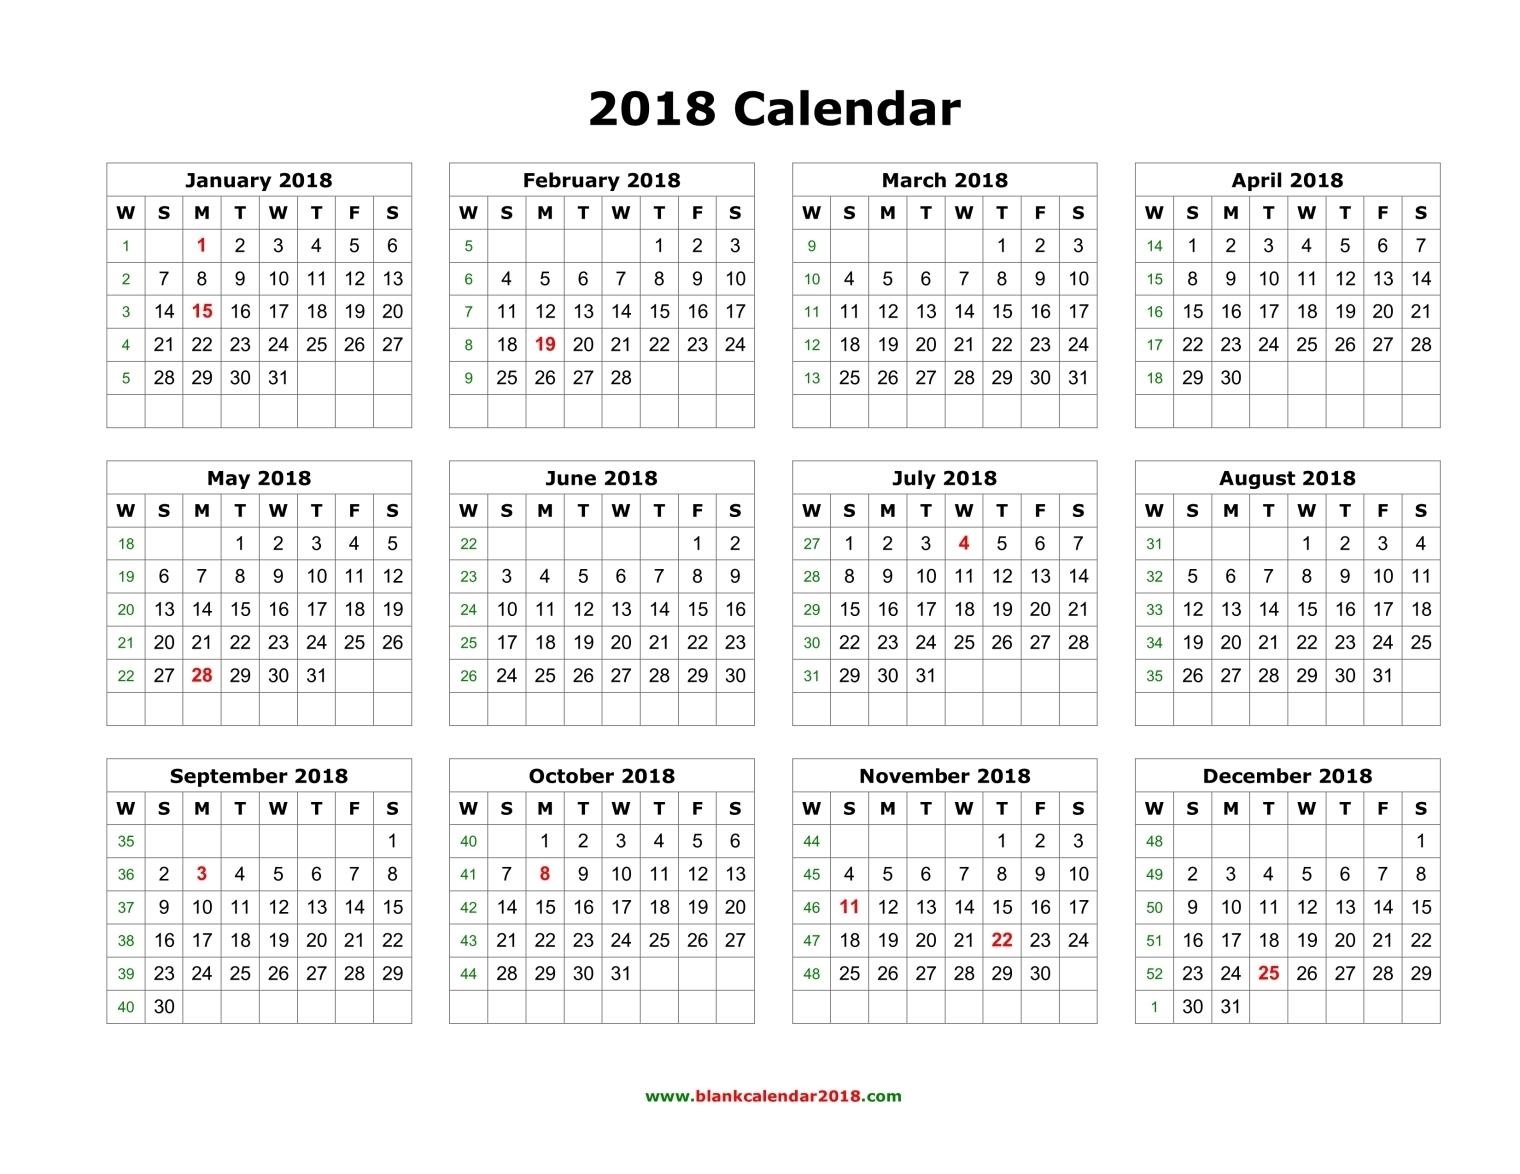 FREE Fully Editable 2018 Calendar Template in Word!